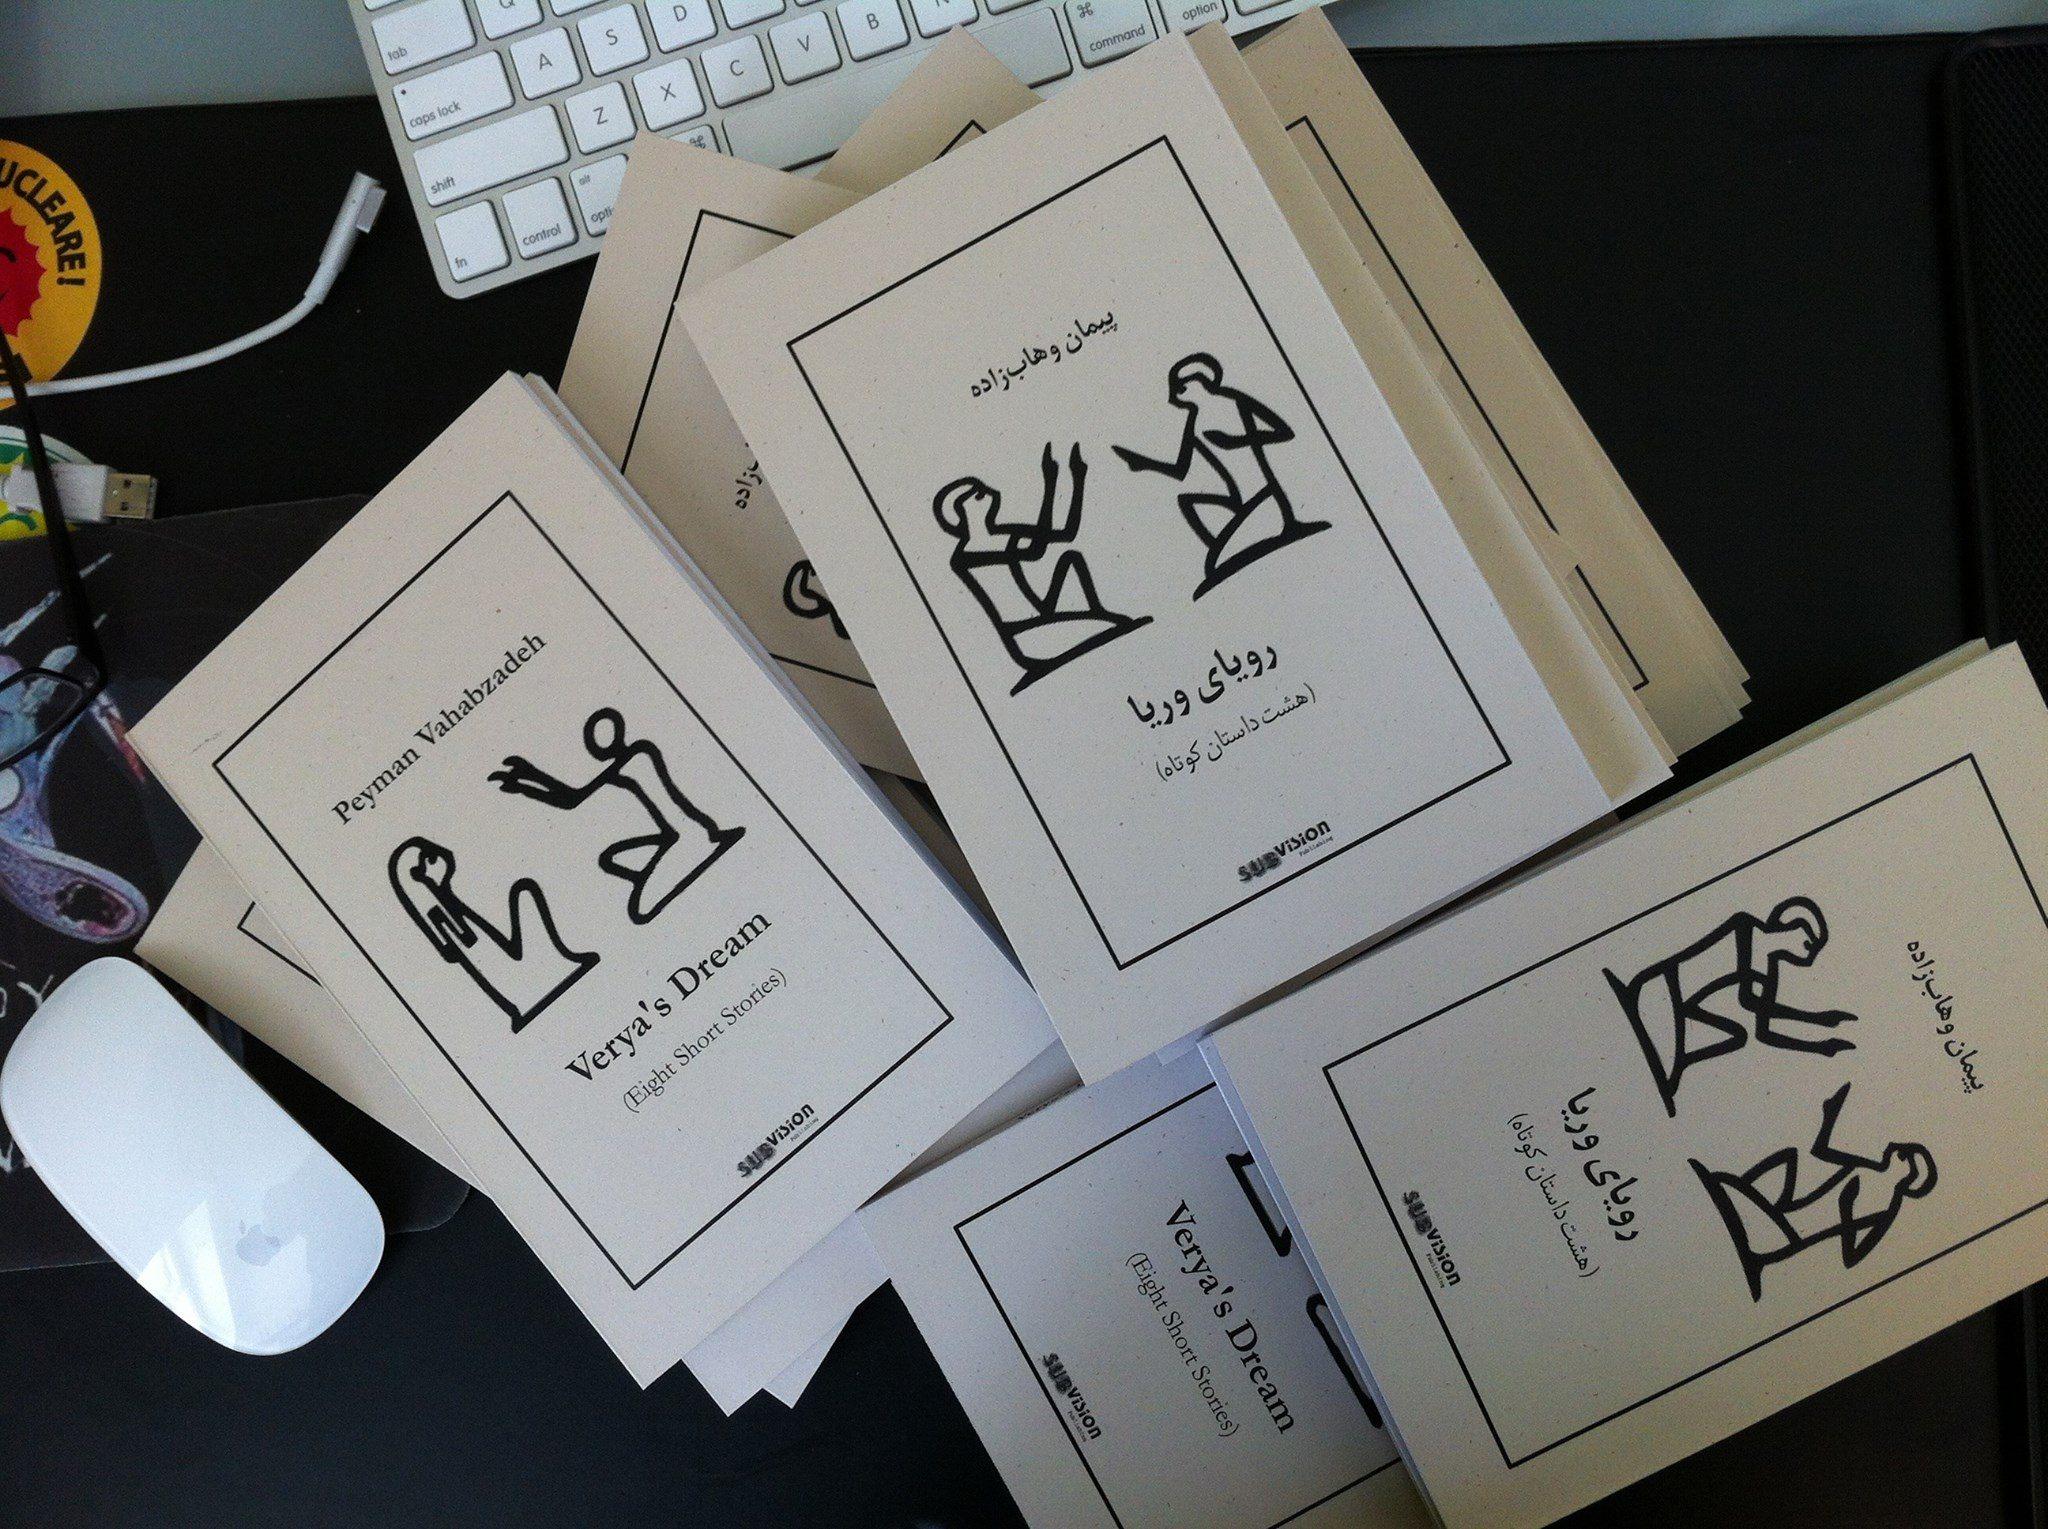 Peyman book